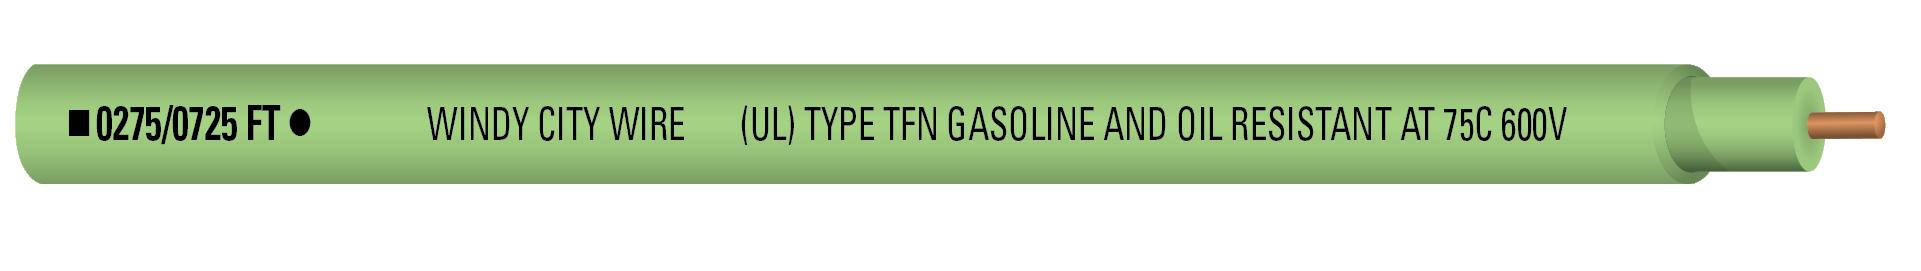 16-1C SOL TFN 600V Grn